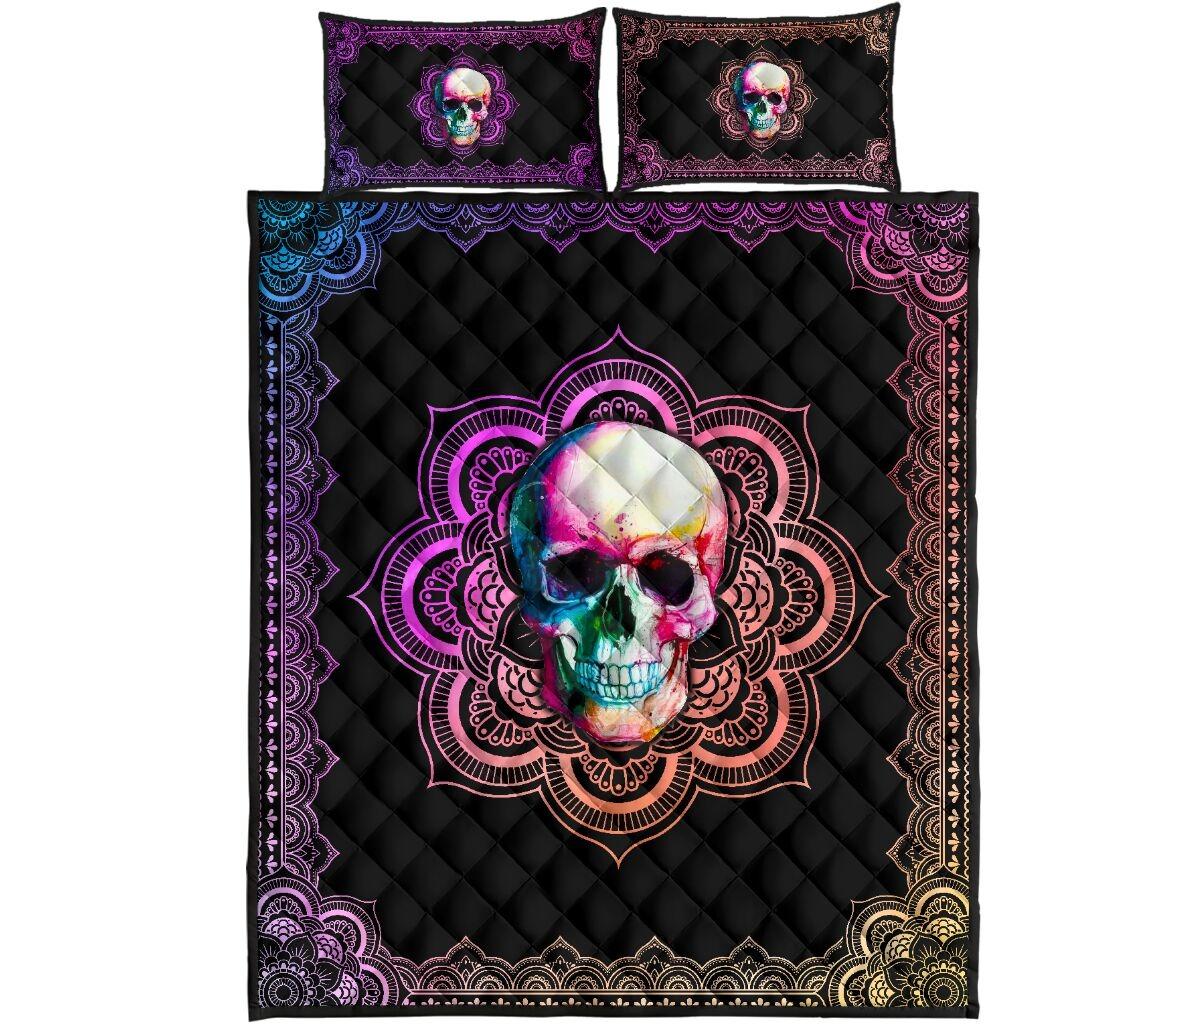 Skull mandala color quilt bedding set 11